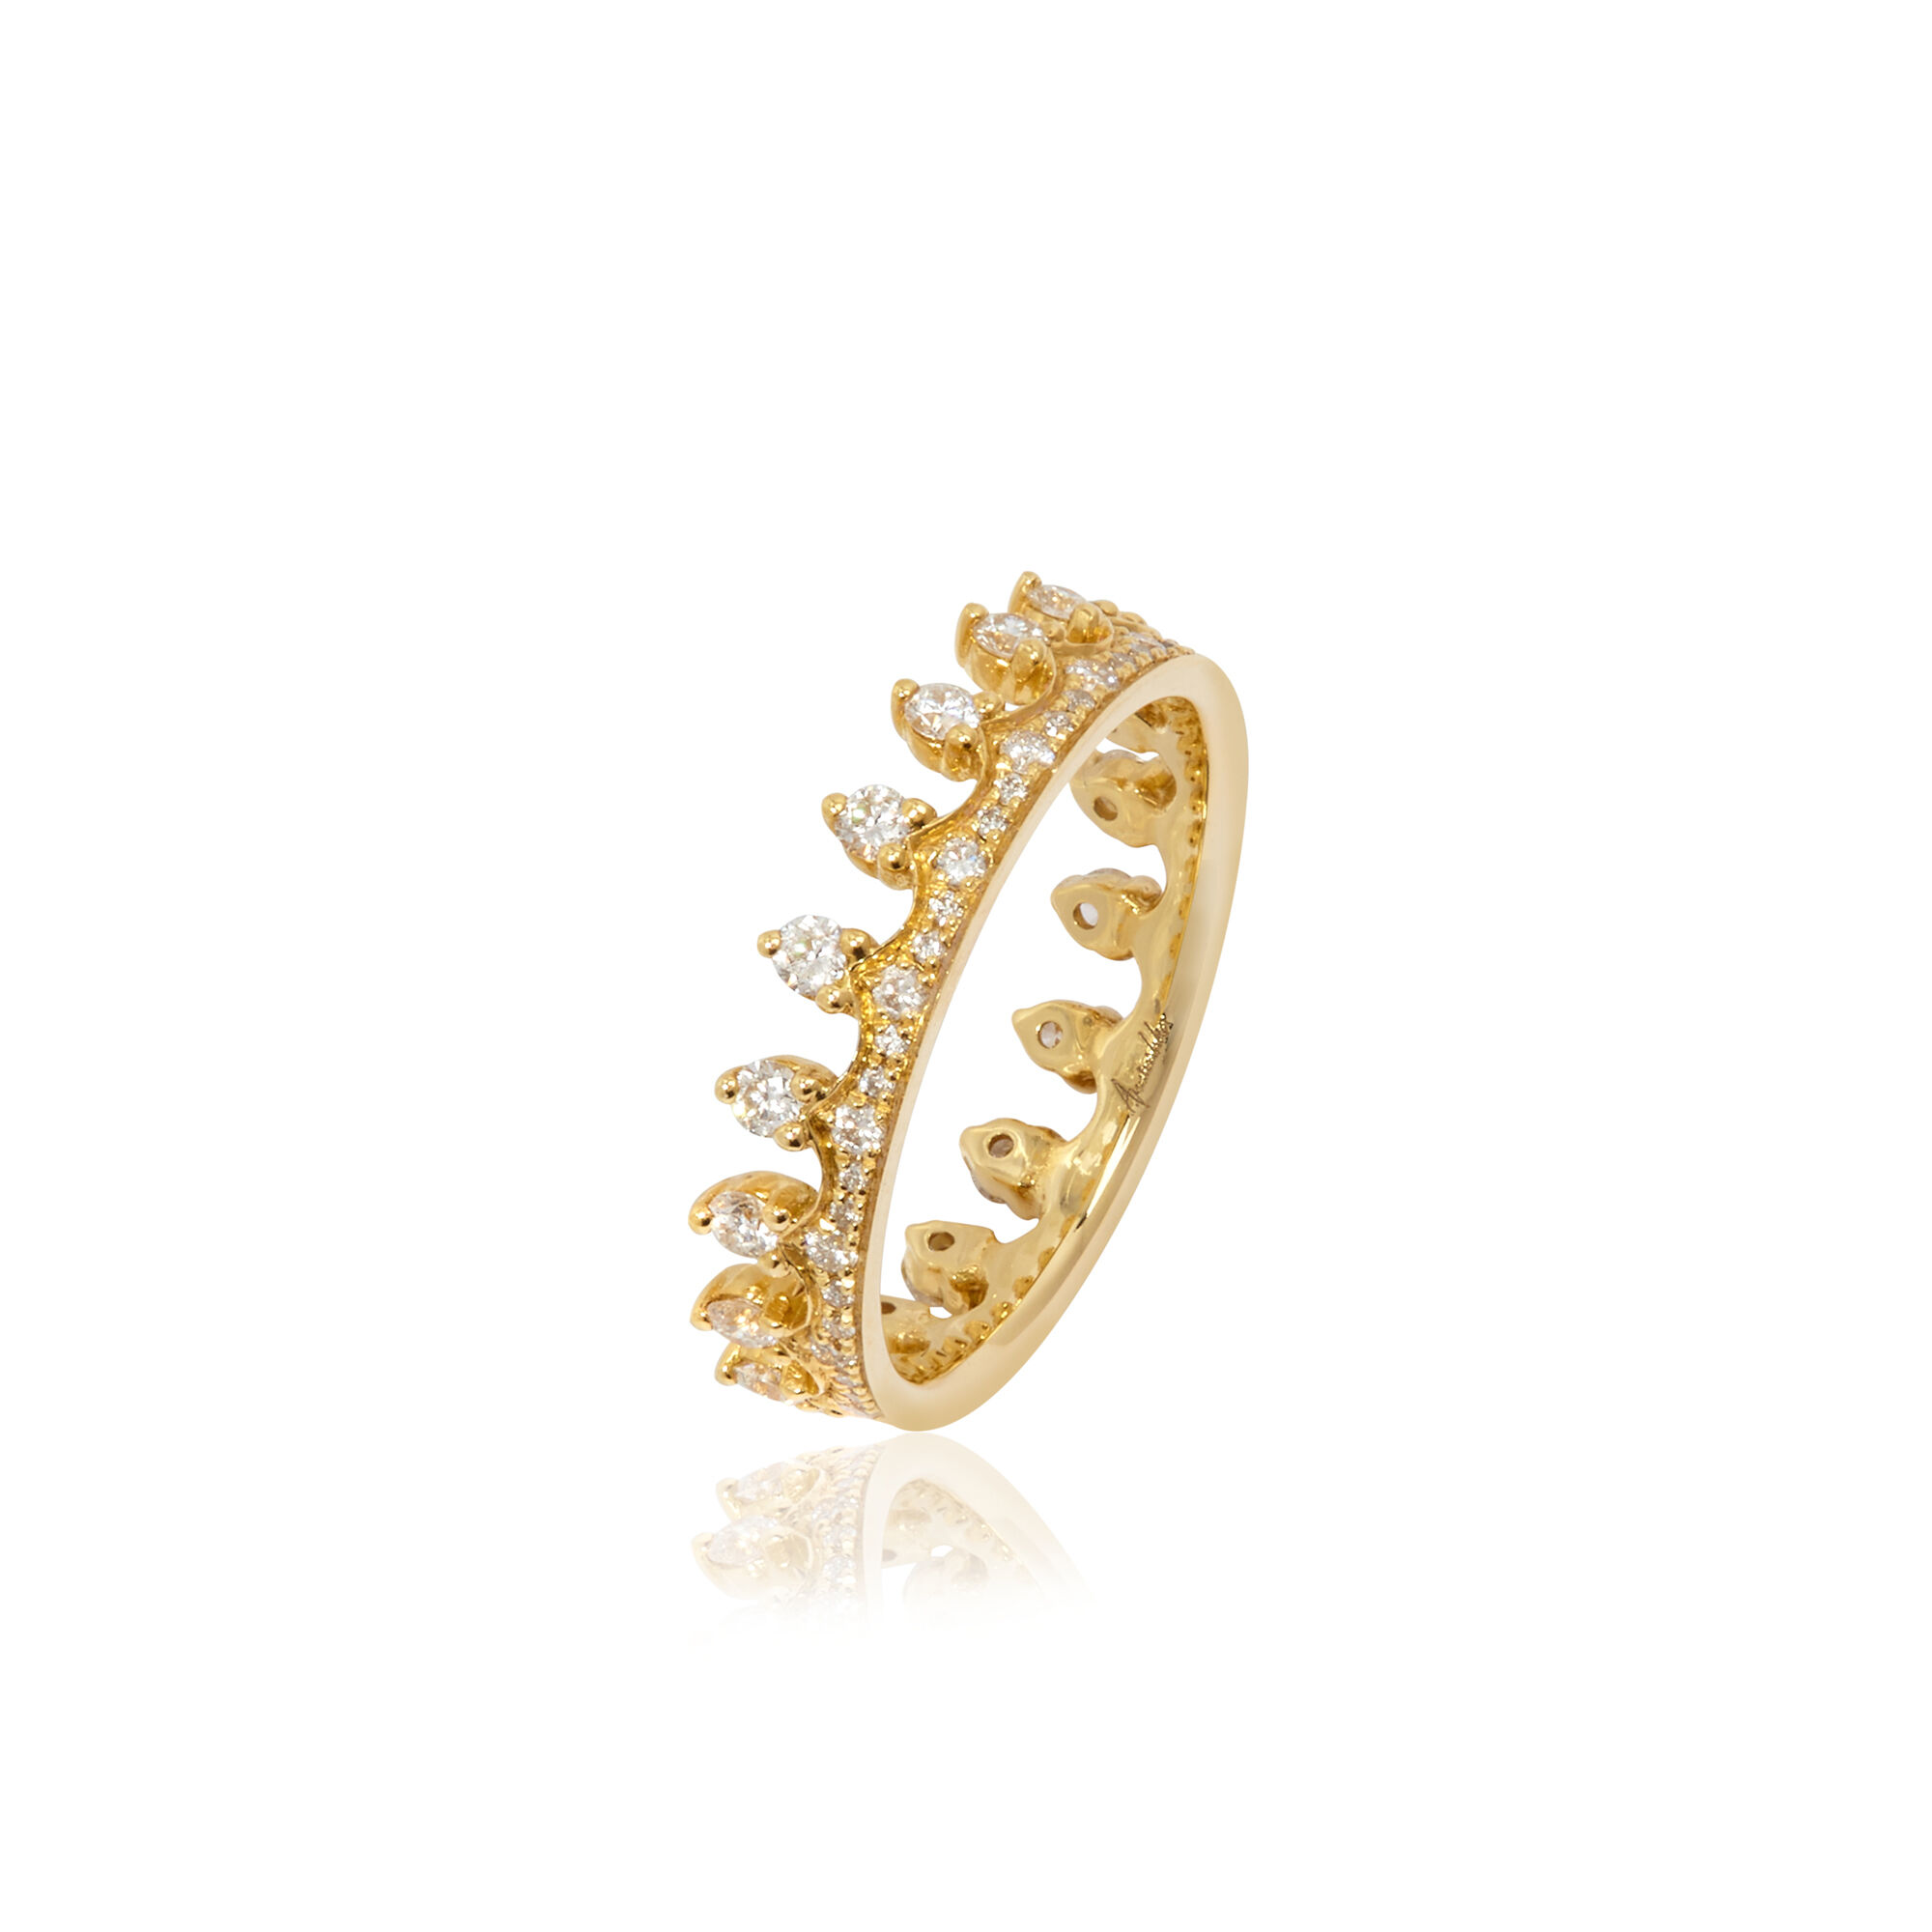 Crown 18ct Gold Diamond Ring Annoushka Us